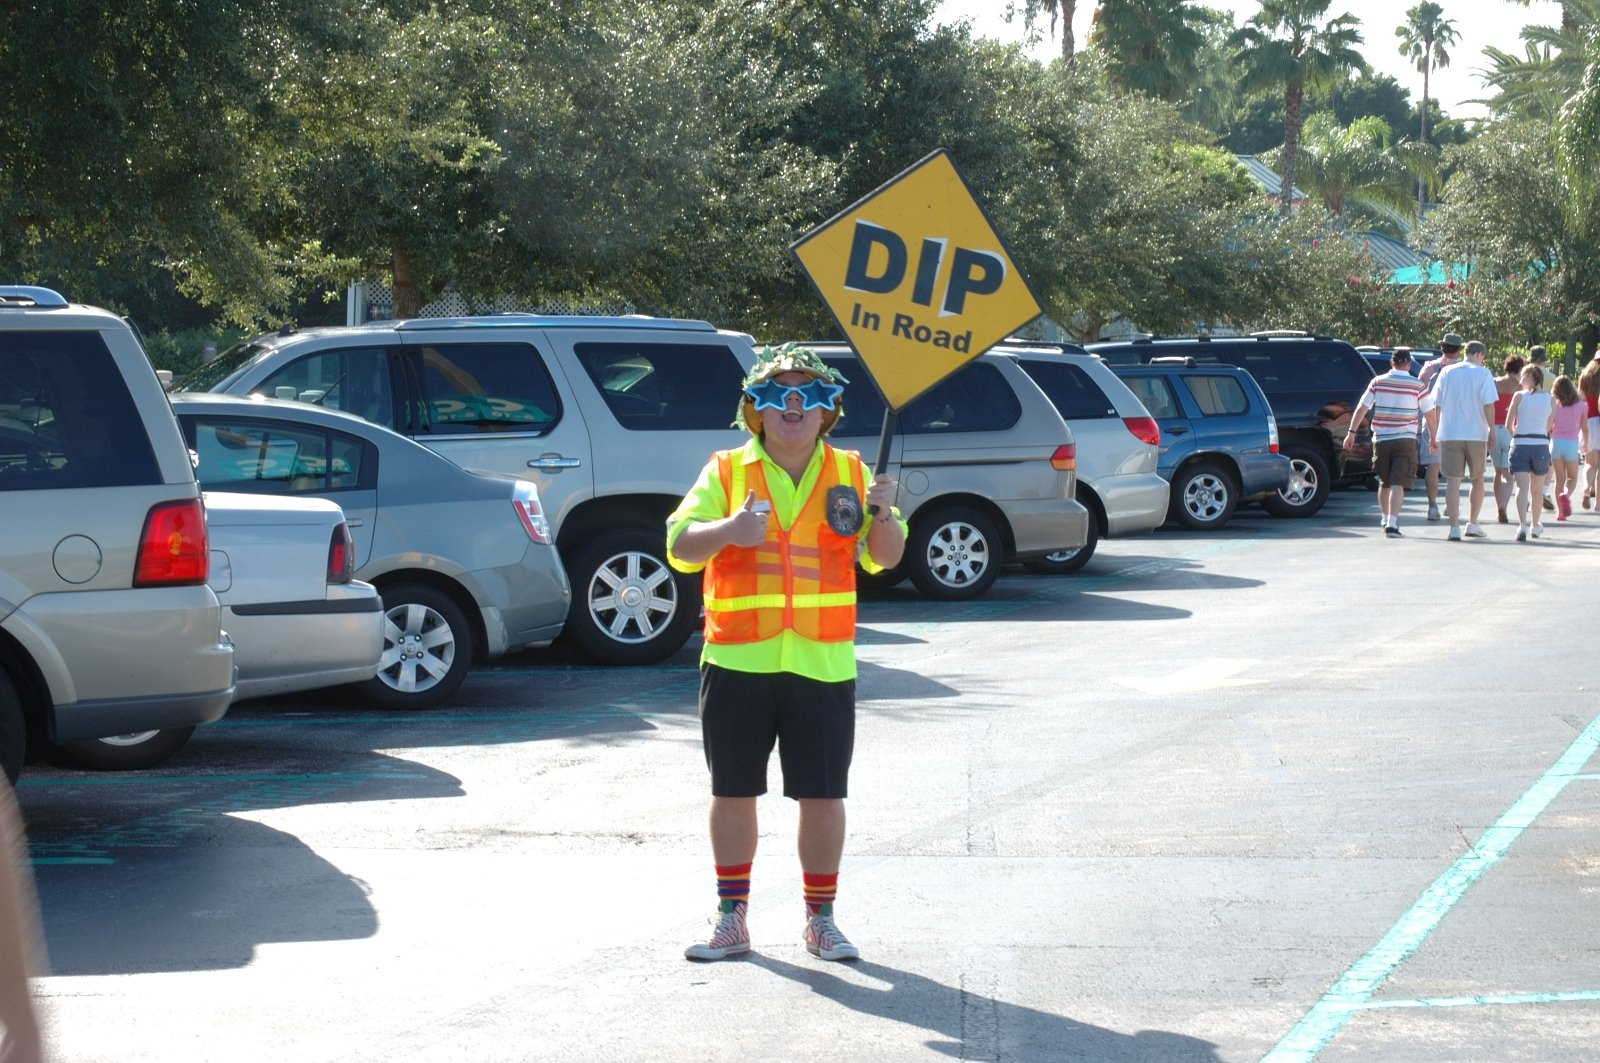 Car Parking Attendant